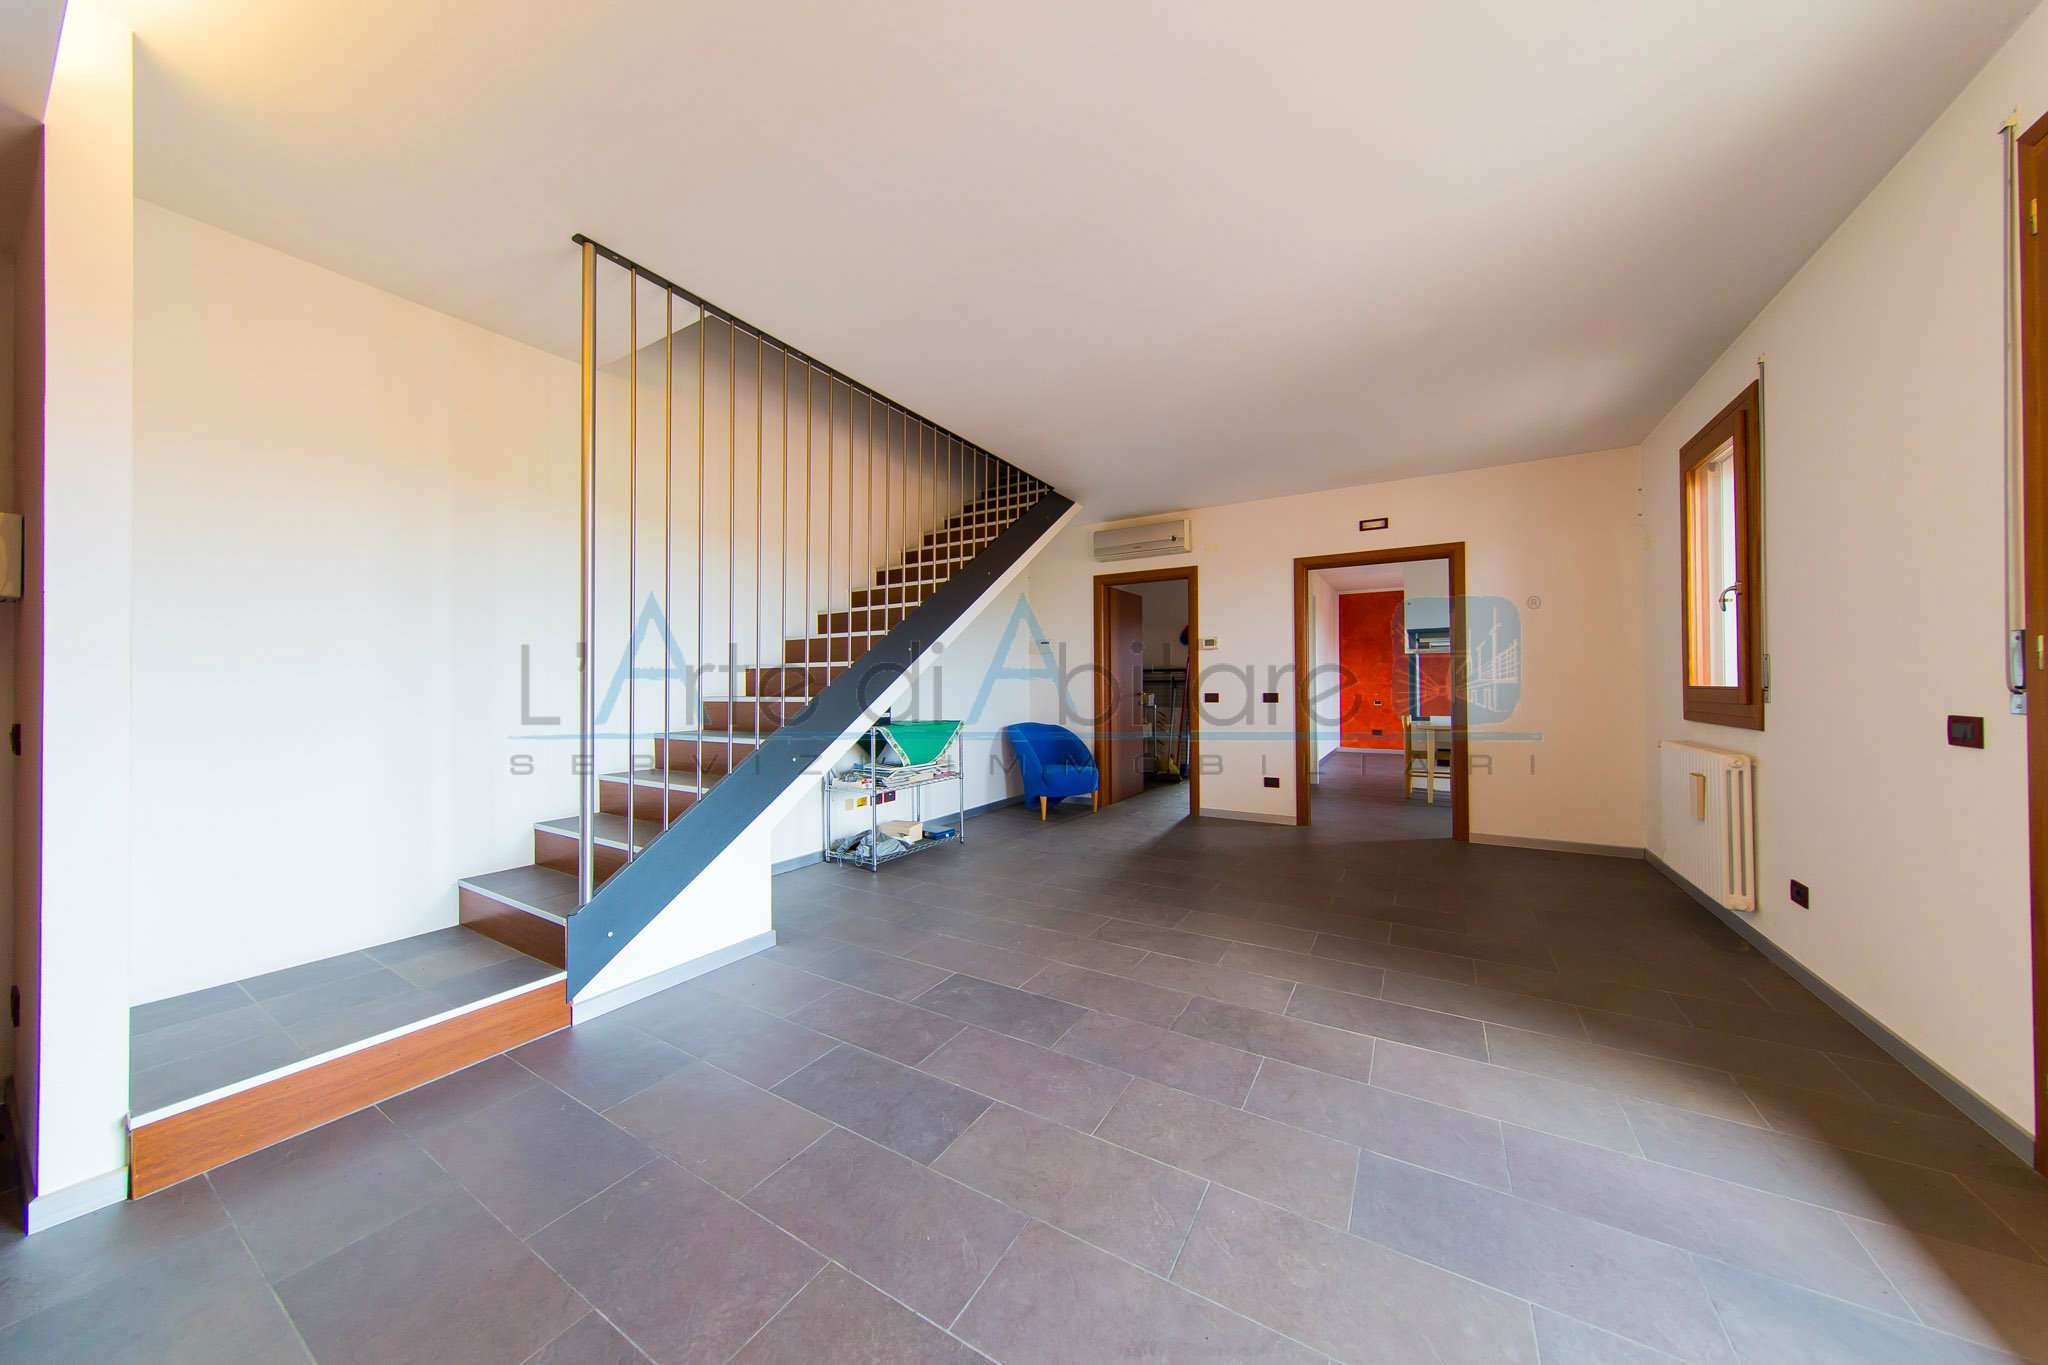 Appartamento di 120 mq con mansarda e cucina separata